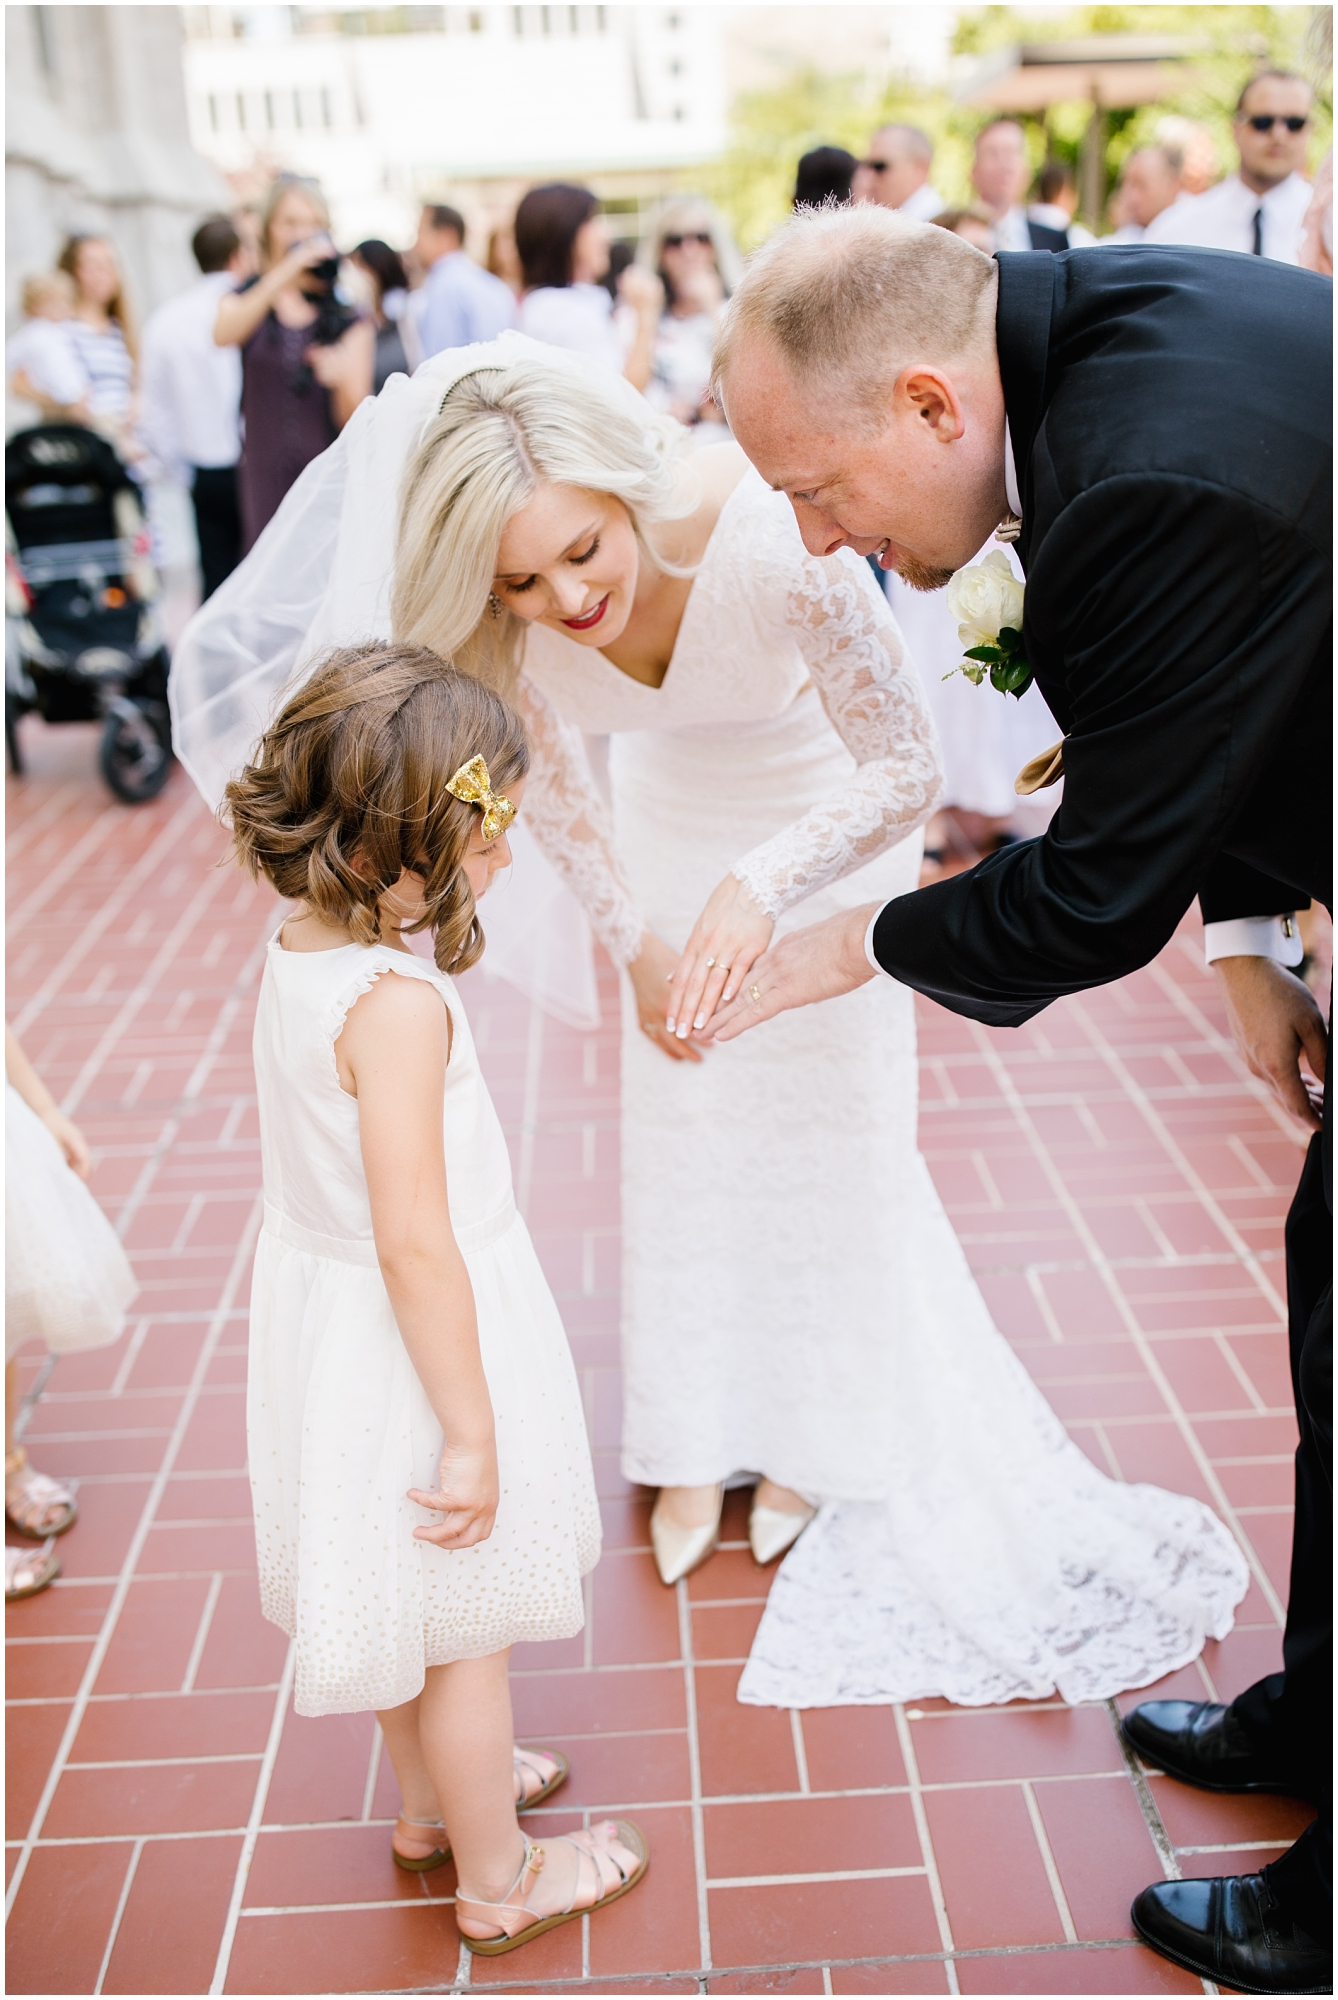 CherylandTyler-39_Lizzie-B-Imagery-Utah-Wedding-Photographer-Park-City-Salt-Lake-City-Temple-Wells-Fargo-Building.jpg